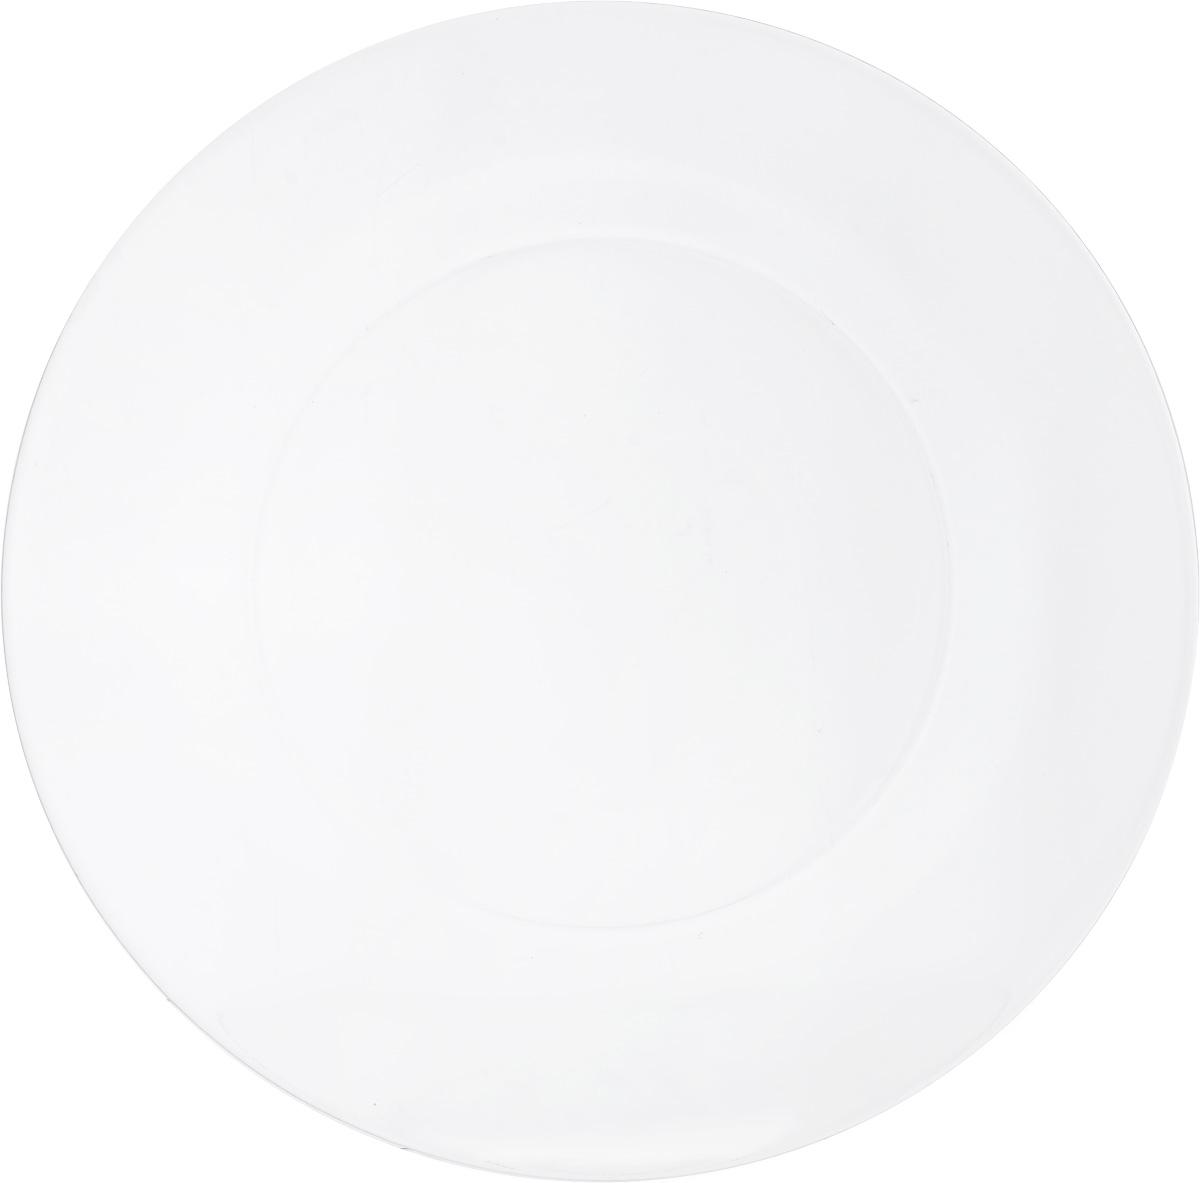 Тарелка обеденная OSZ Симпатия, диаметр 25 см115510Тарелка обеденная OSZ Симпатия выполнена из стекла. Диаметр тарелки (по верхнему краю): 25 см.